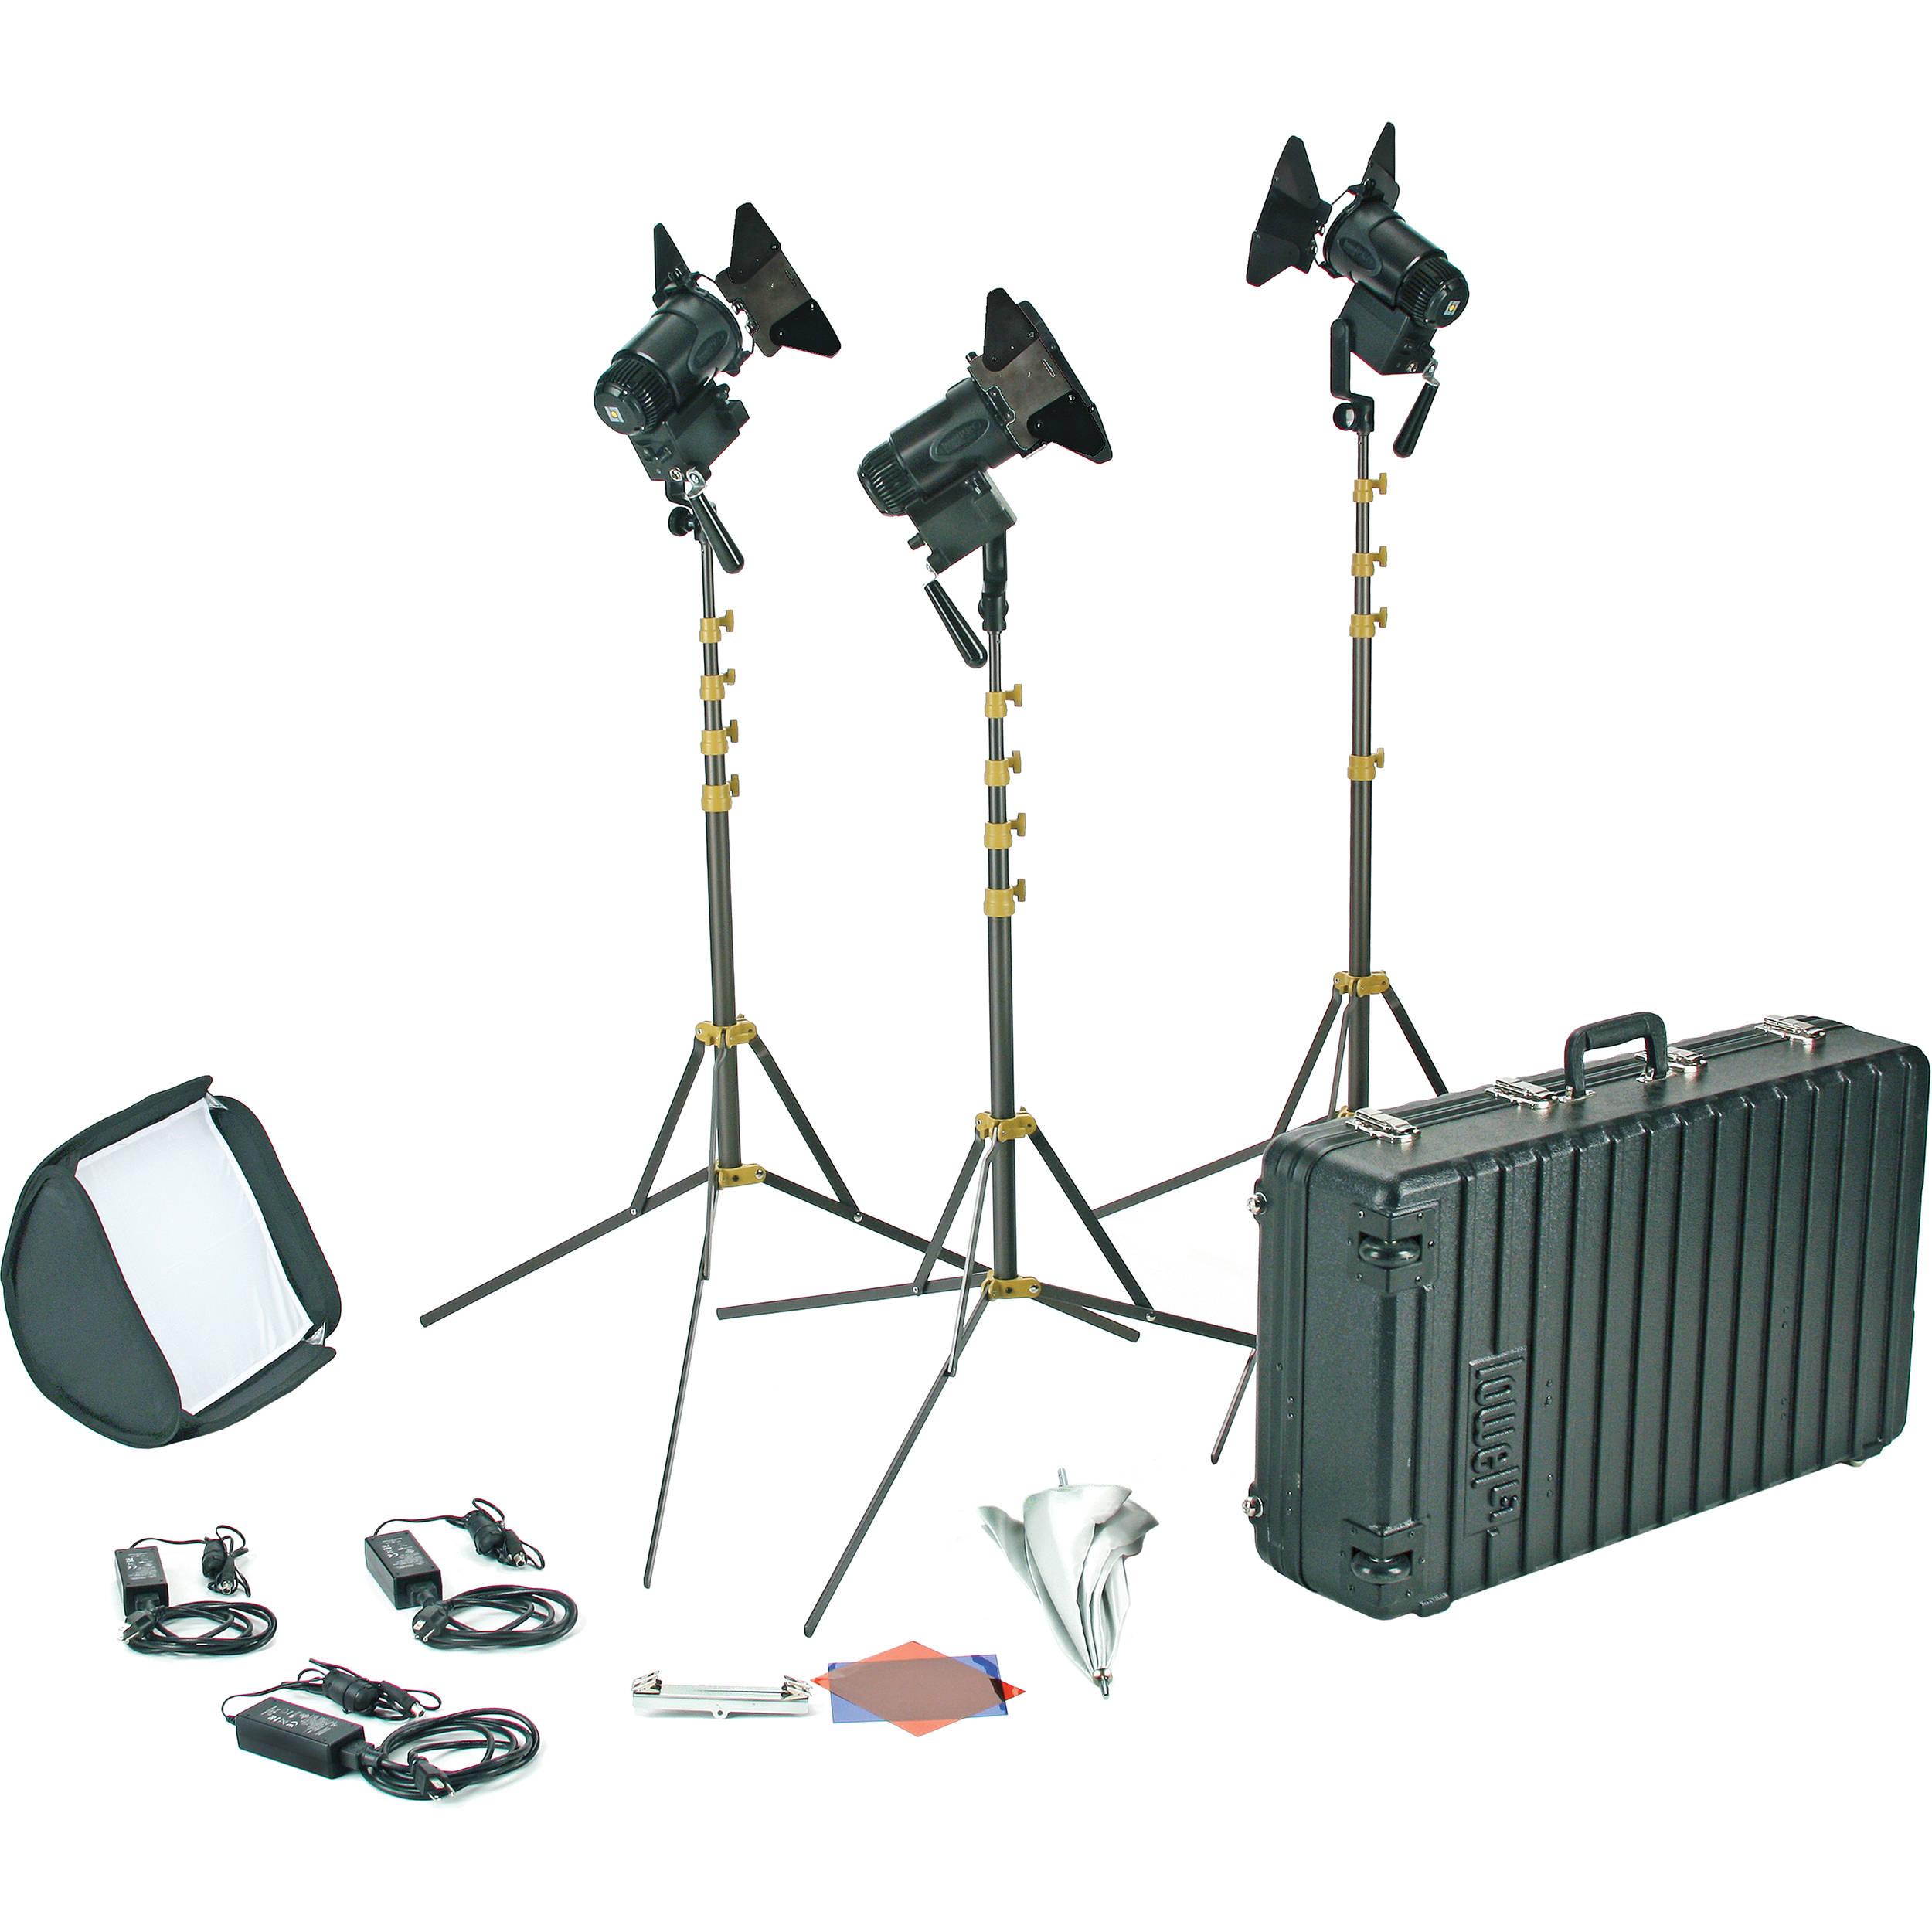 lowel pro power daylight led 3 light ac kit g5 93da b h photo  sc 1 th 225 & B H Photography Lighting Equipment. vidpro led 1x1 professional ...